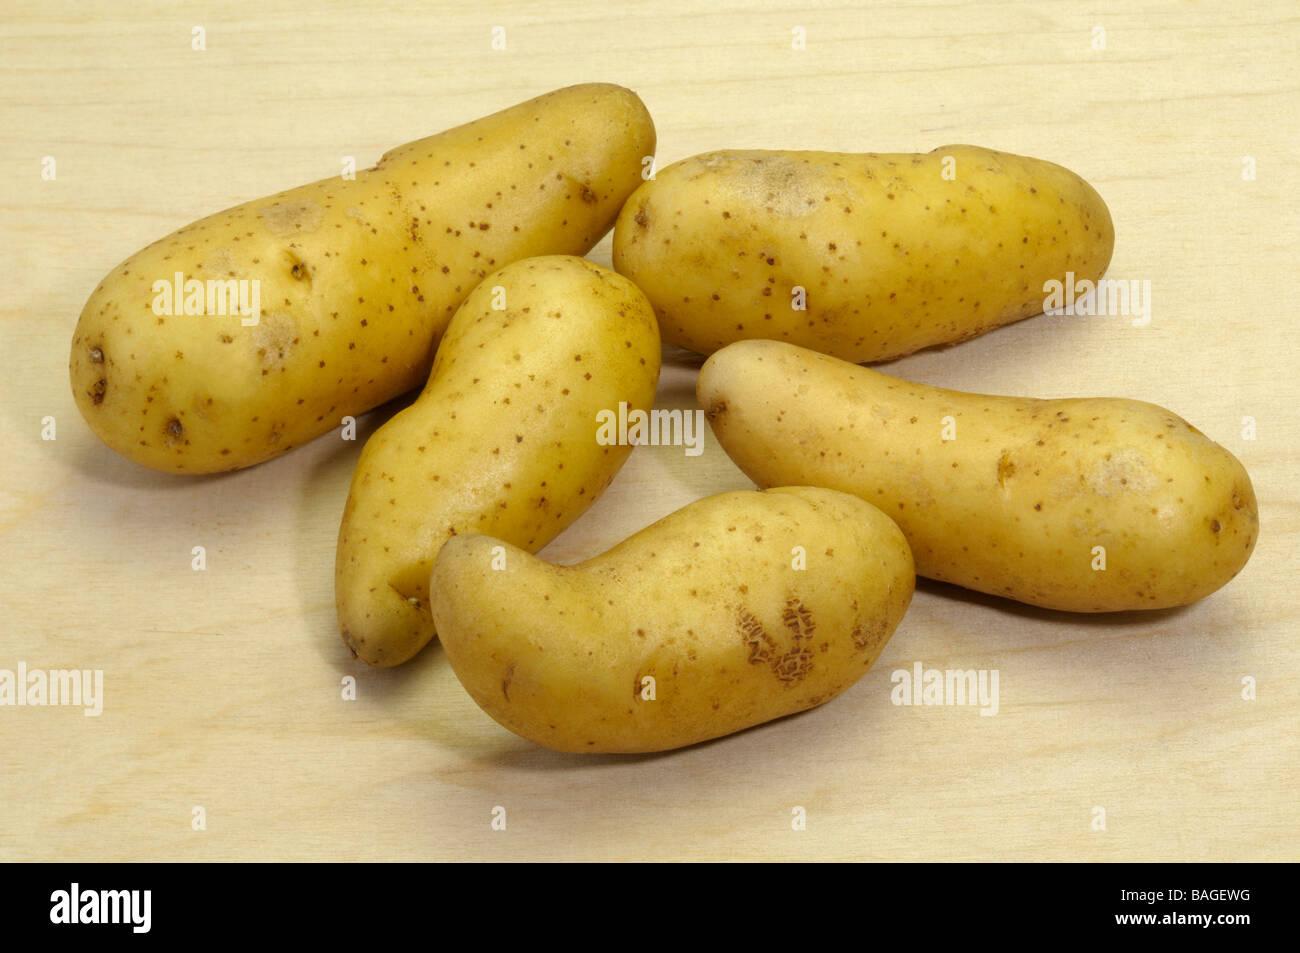 Potato (Solanum tuberosum), variety: La Ratte d Ardeche, studio picture - Stock Image